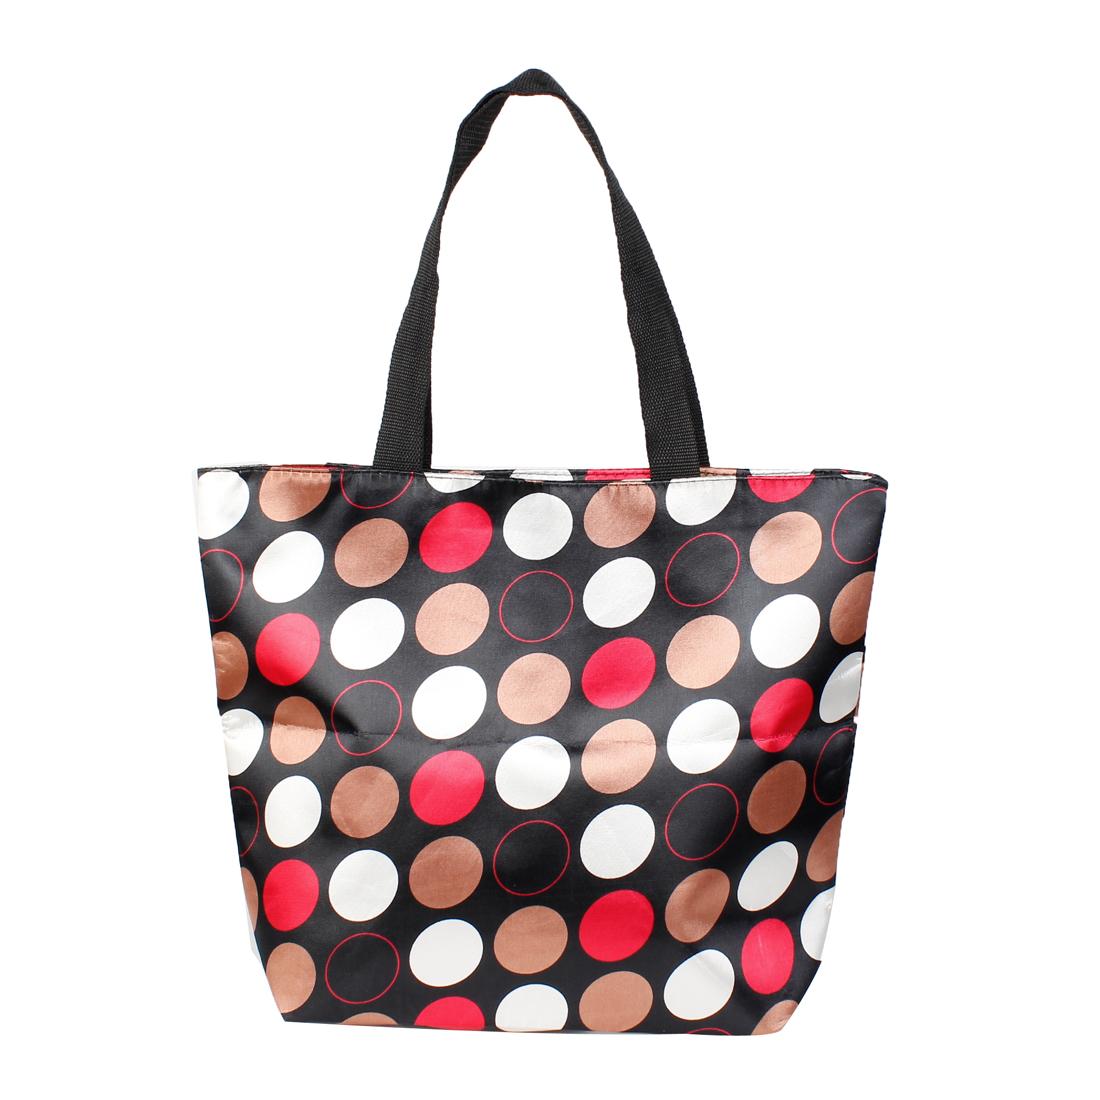 Folded Black Brown Circle Dots Pattern Zipper Reusable Shopping Totes Bag